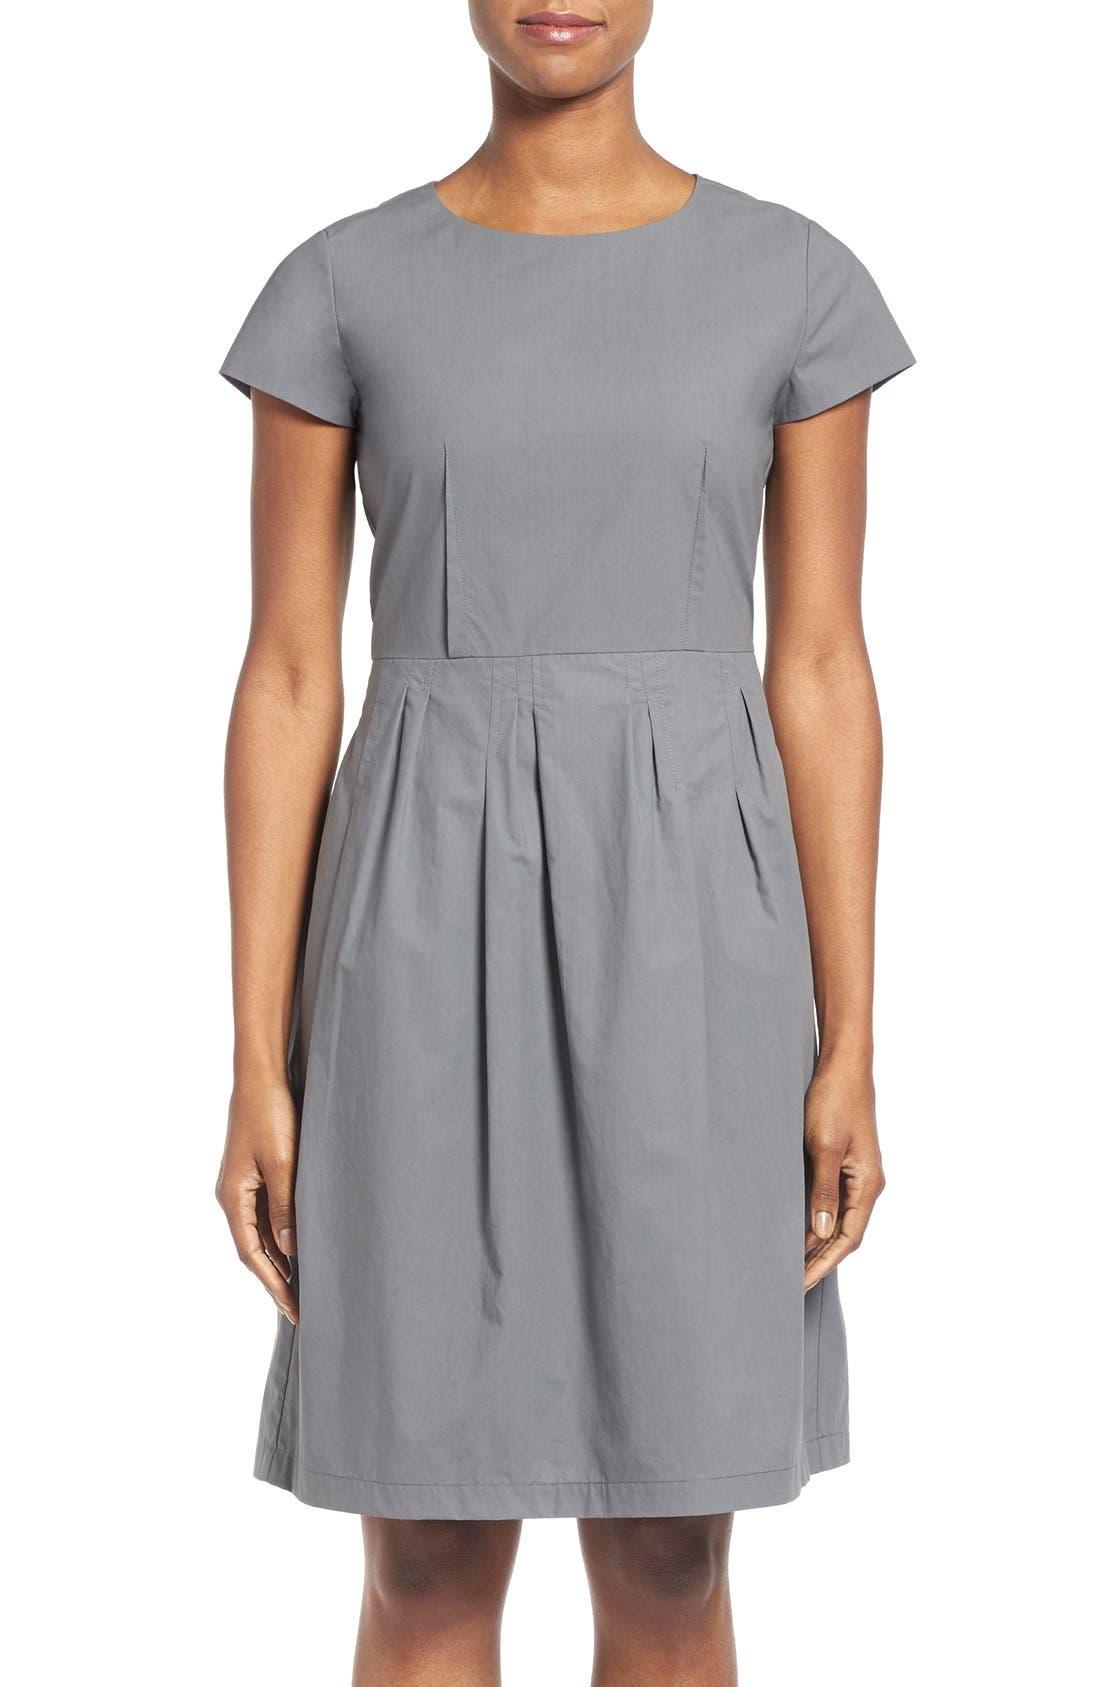 Alternate Image 1 Selected - Lafayette 148 New York 'Gina' Cap Sleeve Fit & Flare Dress